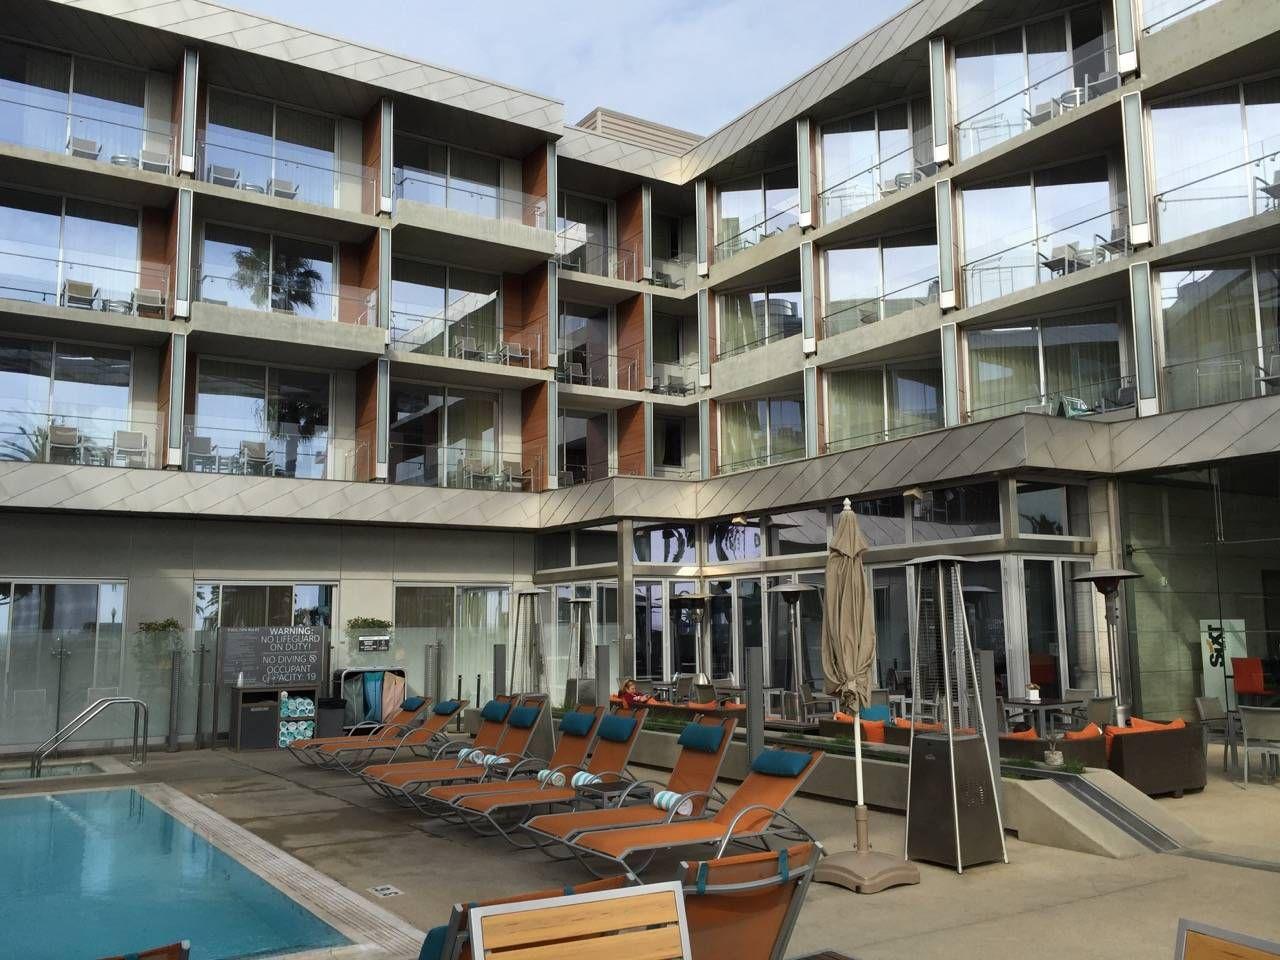 Shore Hotel Santa Monica-017